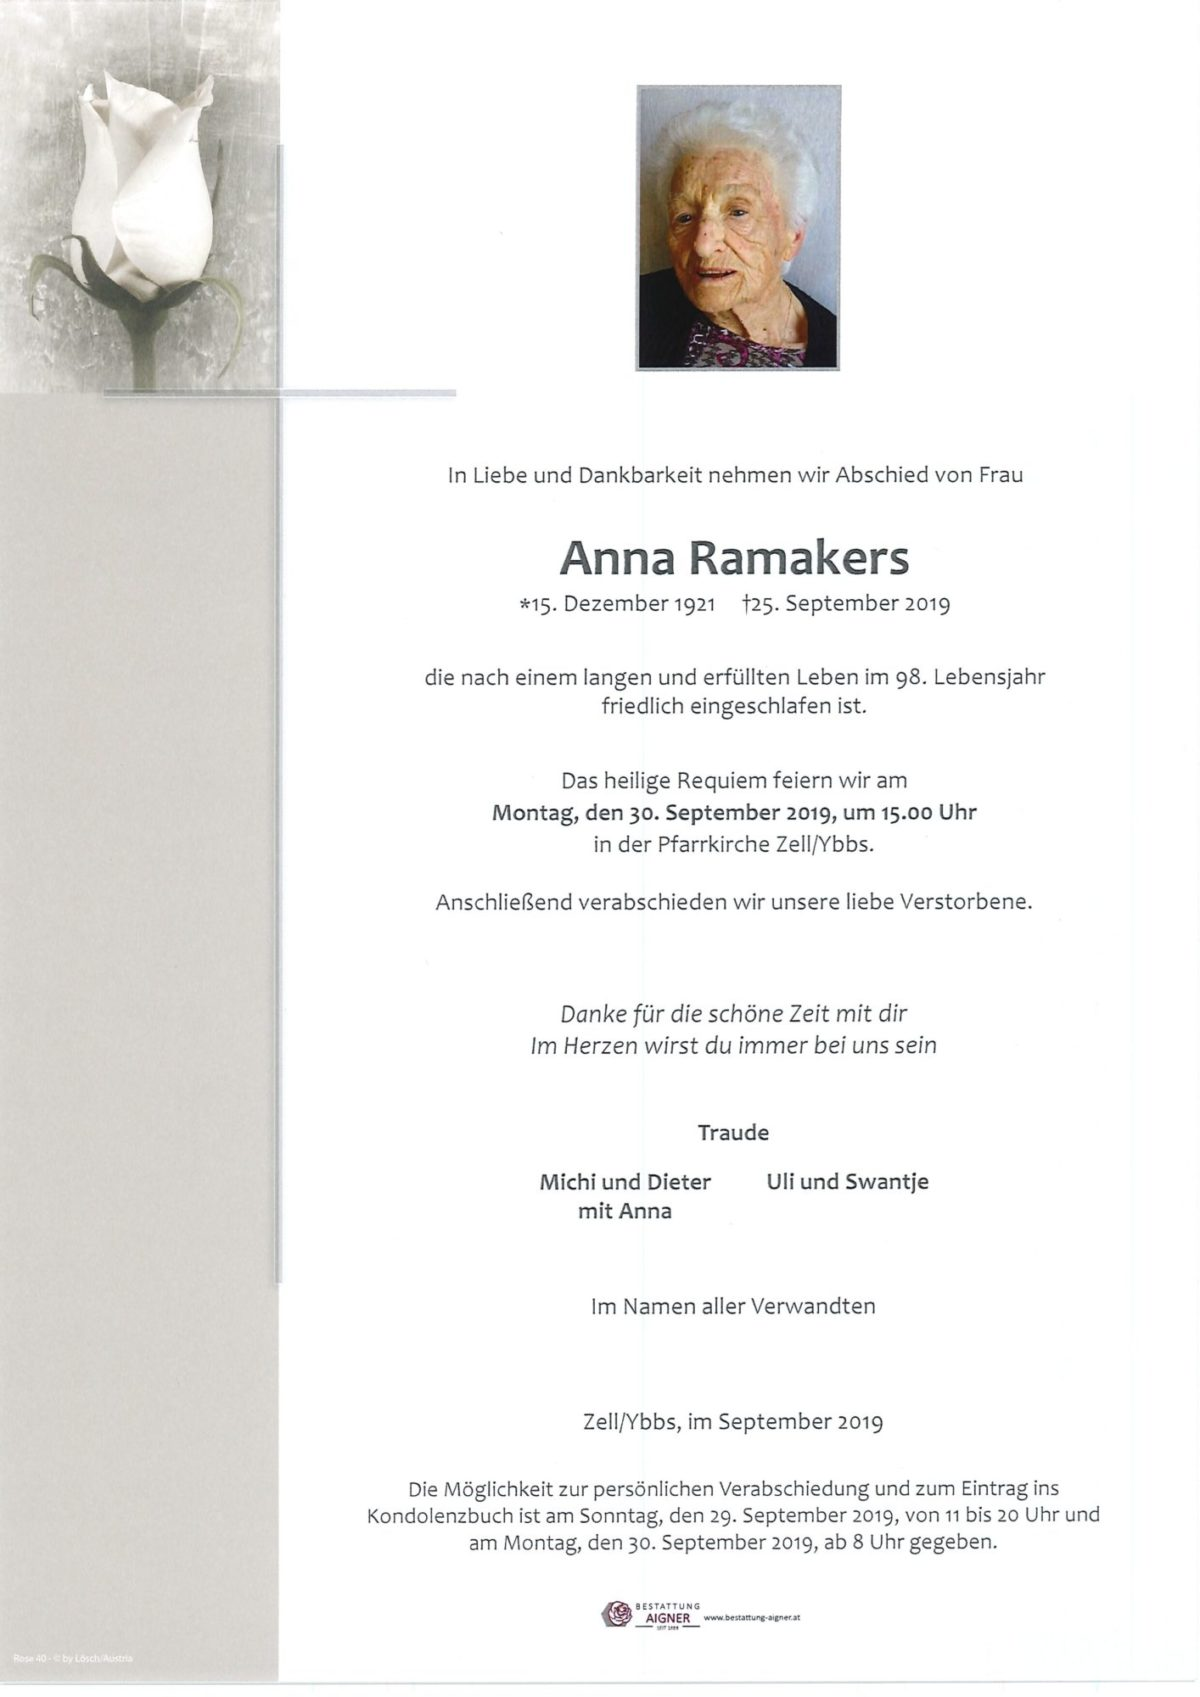 Anna Ramakers